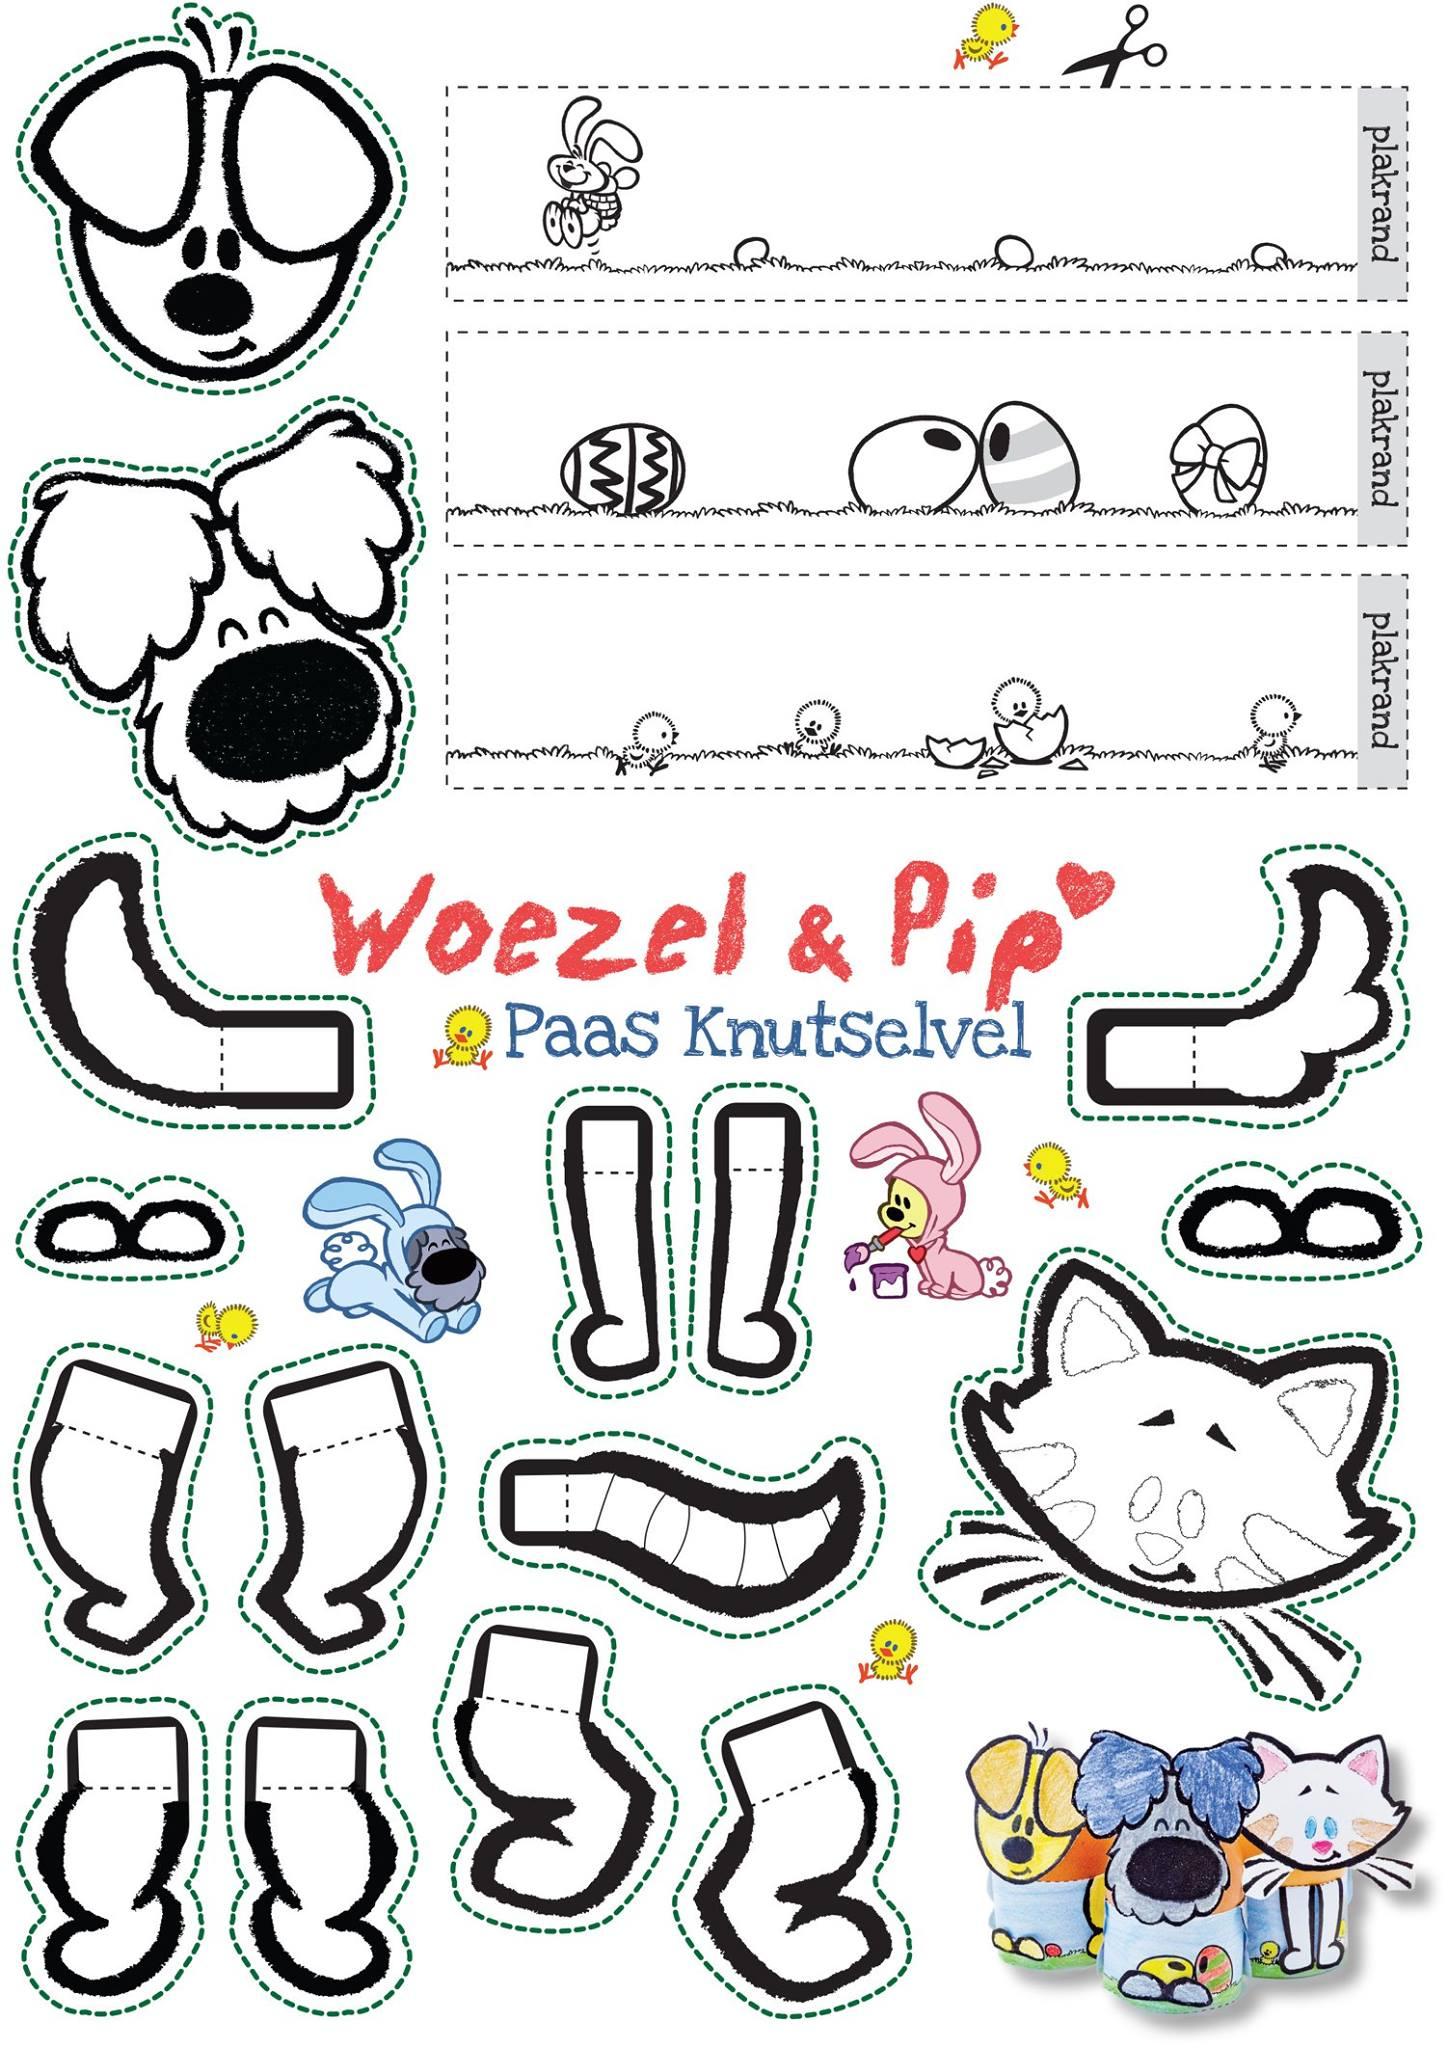 Paasknutselvel Woezel en Pip - Chasse Theater Breda